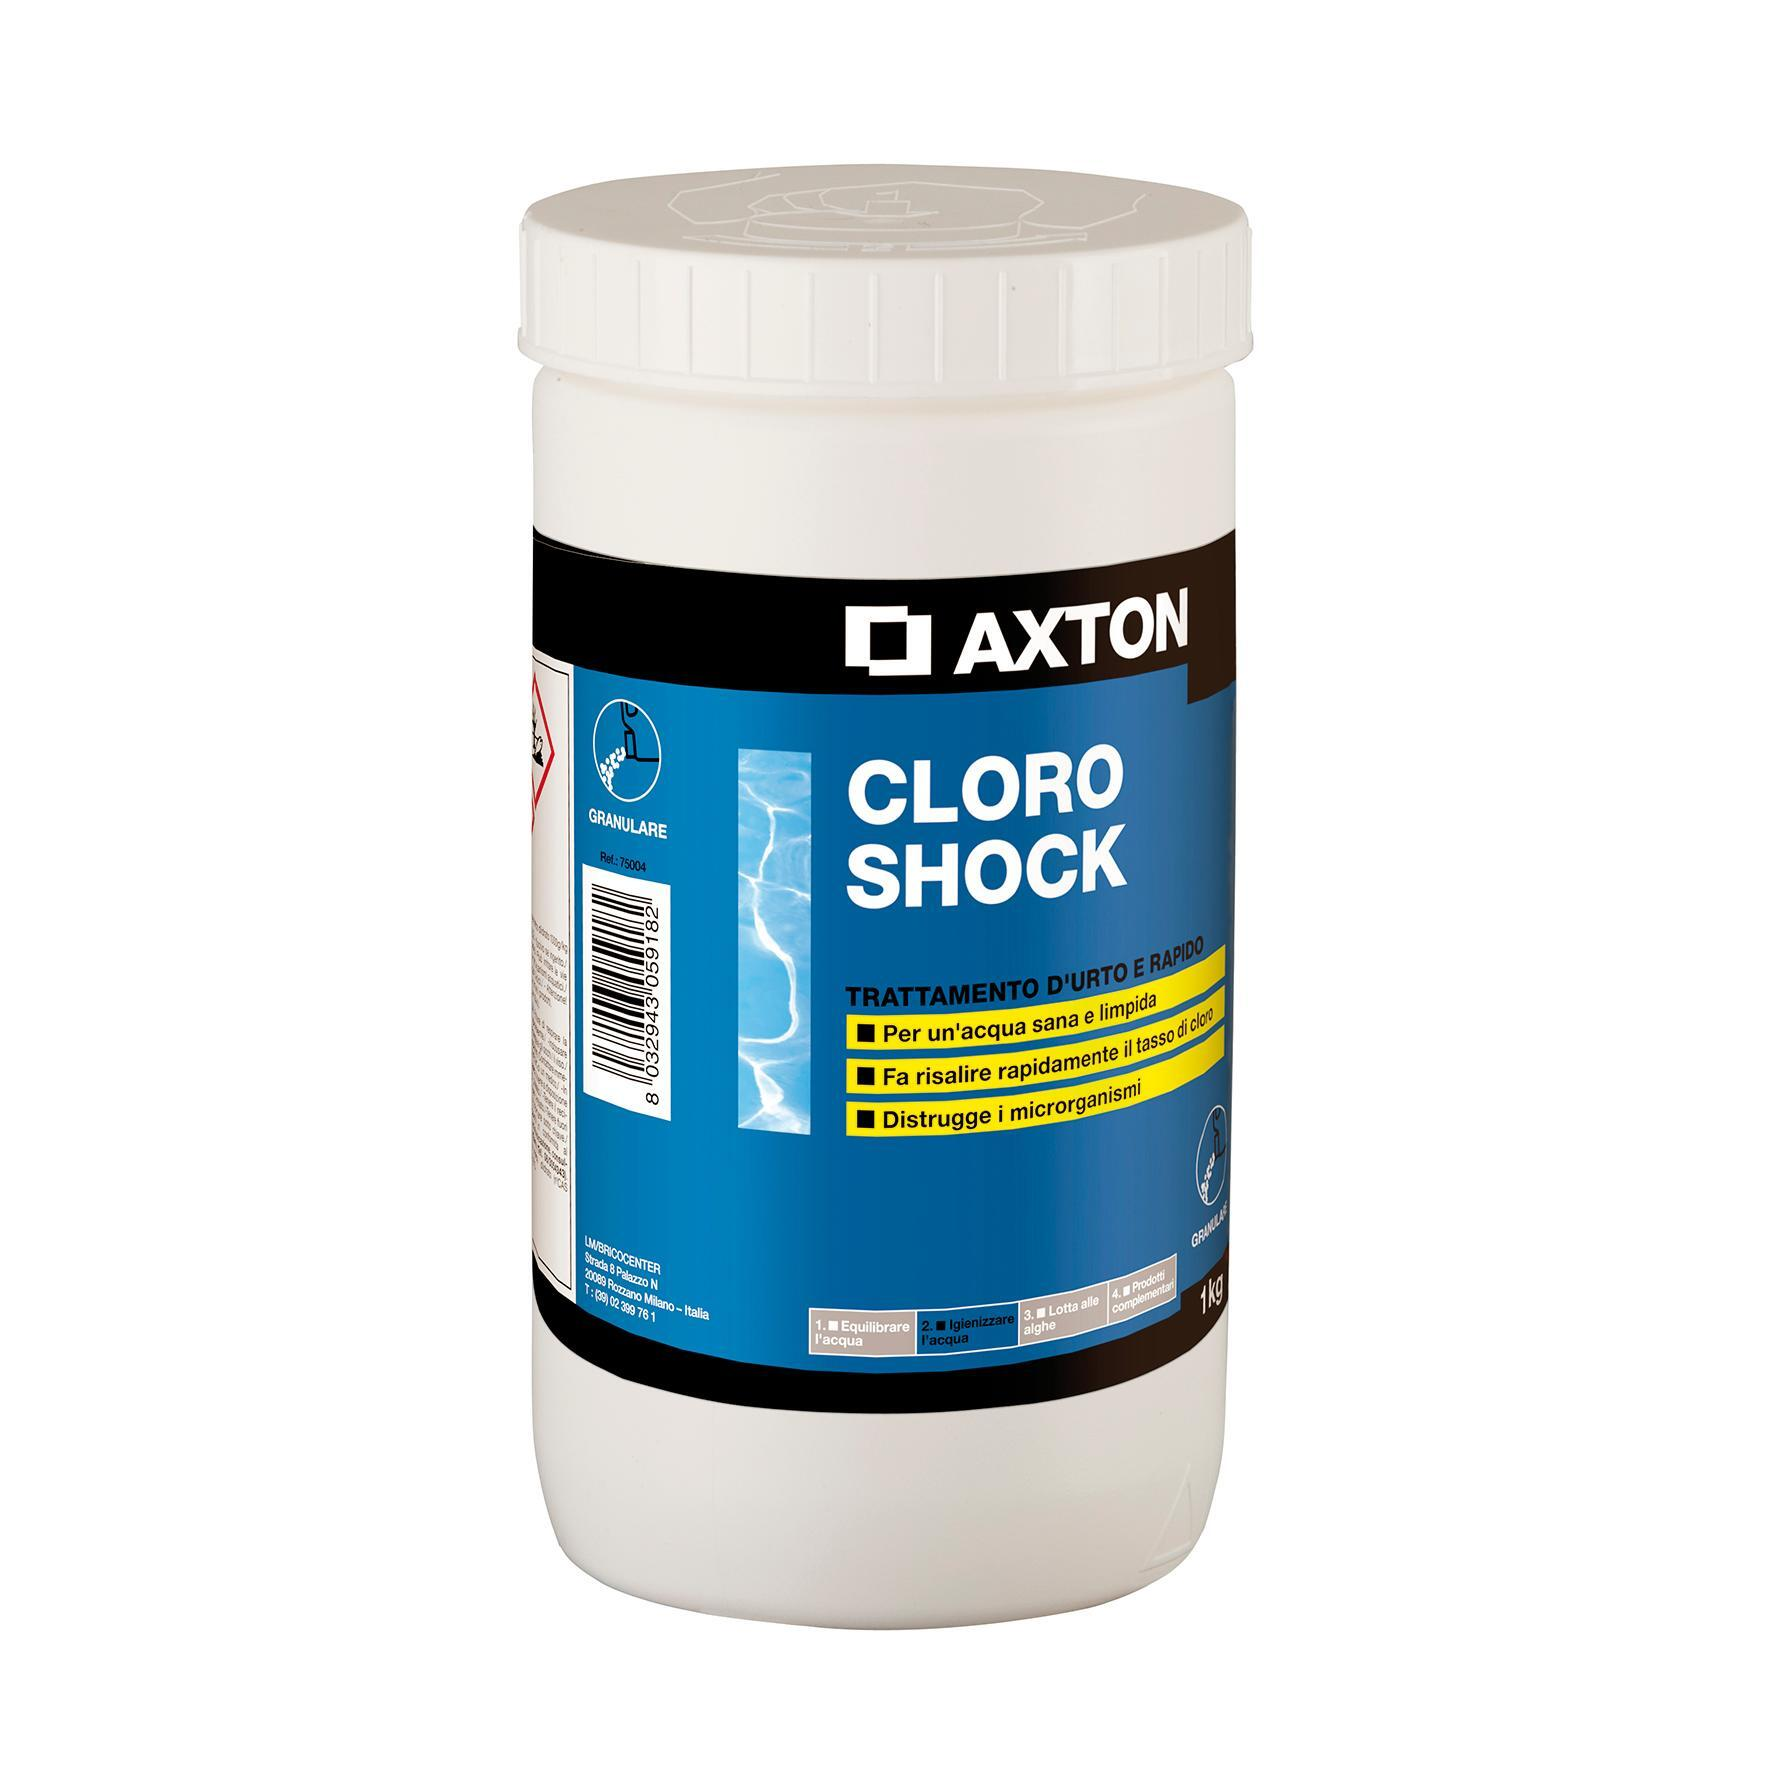 Cloro Shock granulare AXTON 1 kg - 1